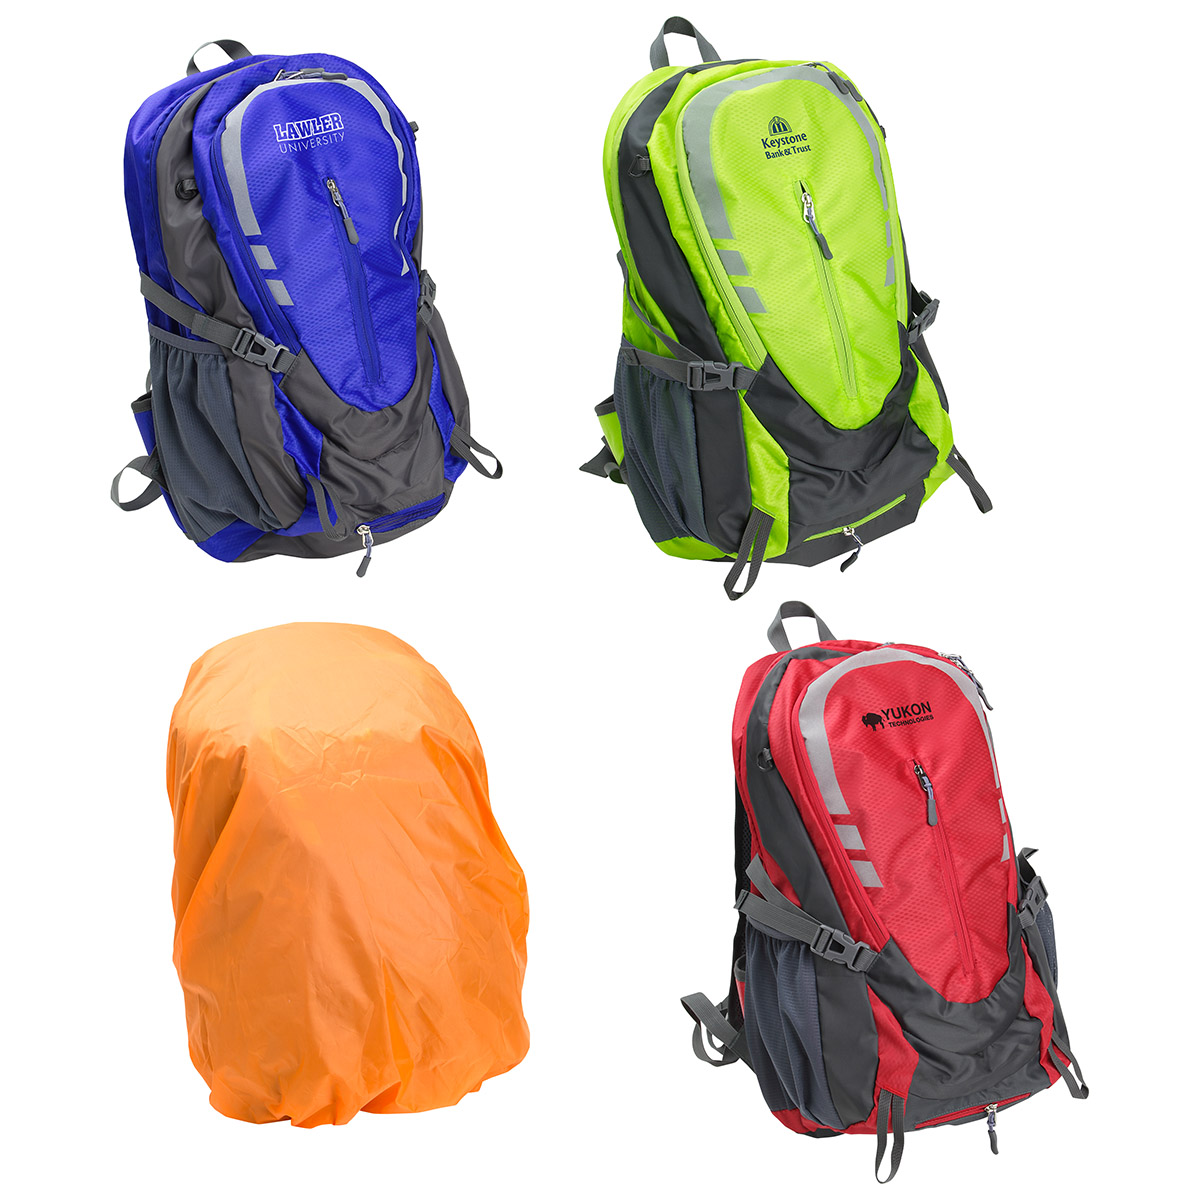 Alpine Hiking Backpack 35L with Rain Cover, WBA-AB17 - 1 Colour Imprint